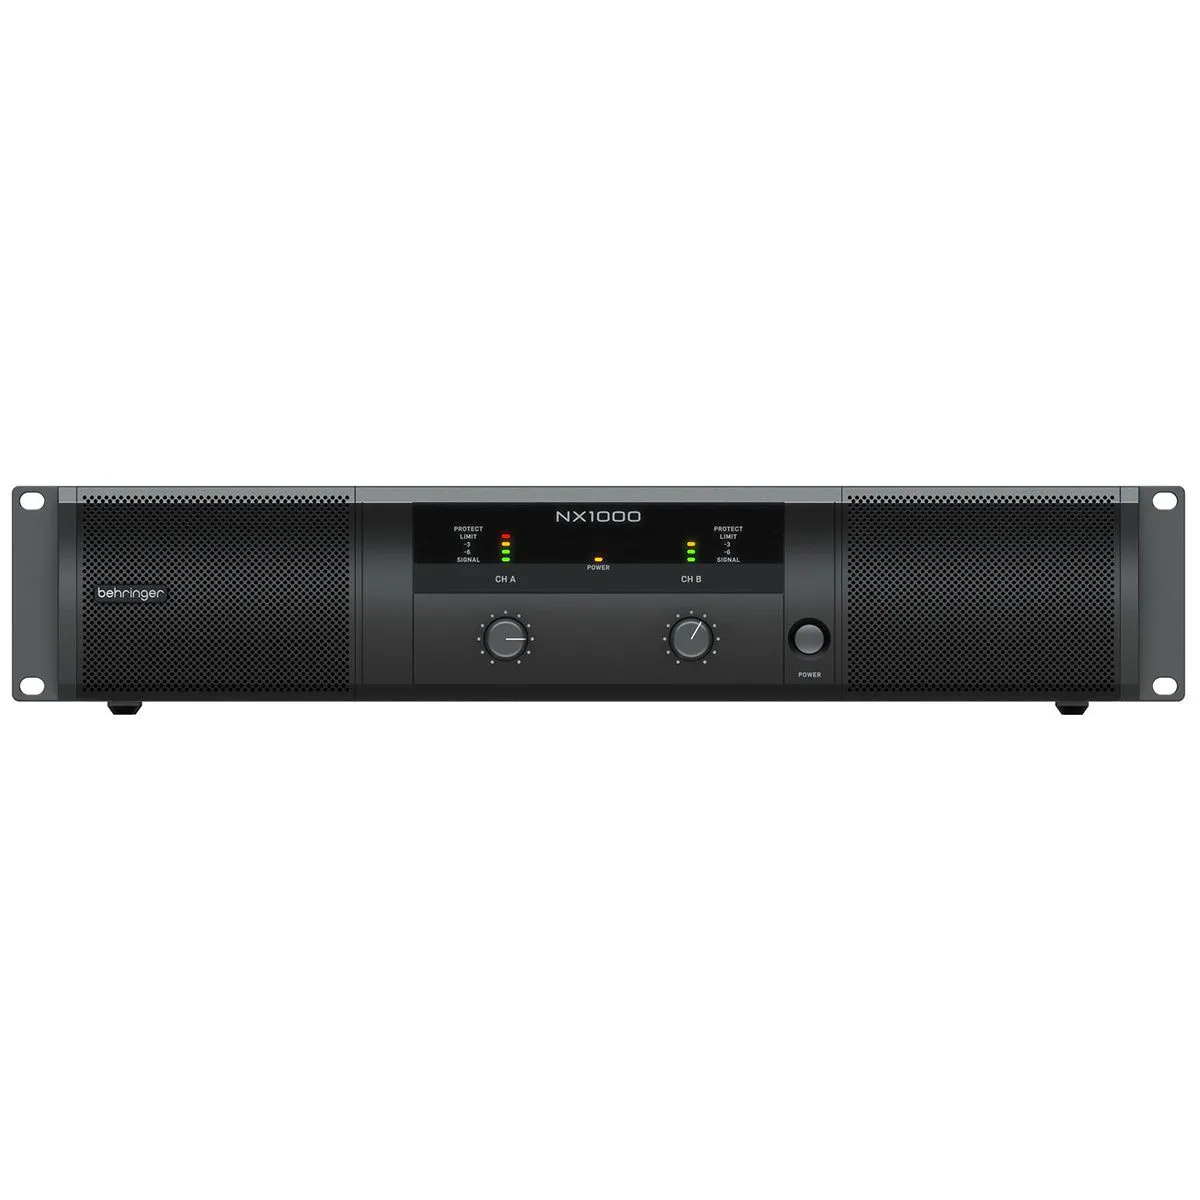 Amplificador de Potência Behringer NX1000 1000W Classe-D SmartSense